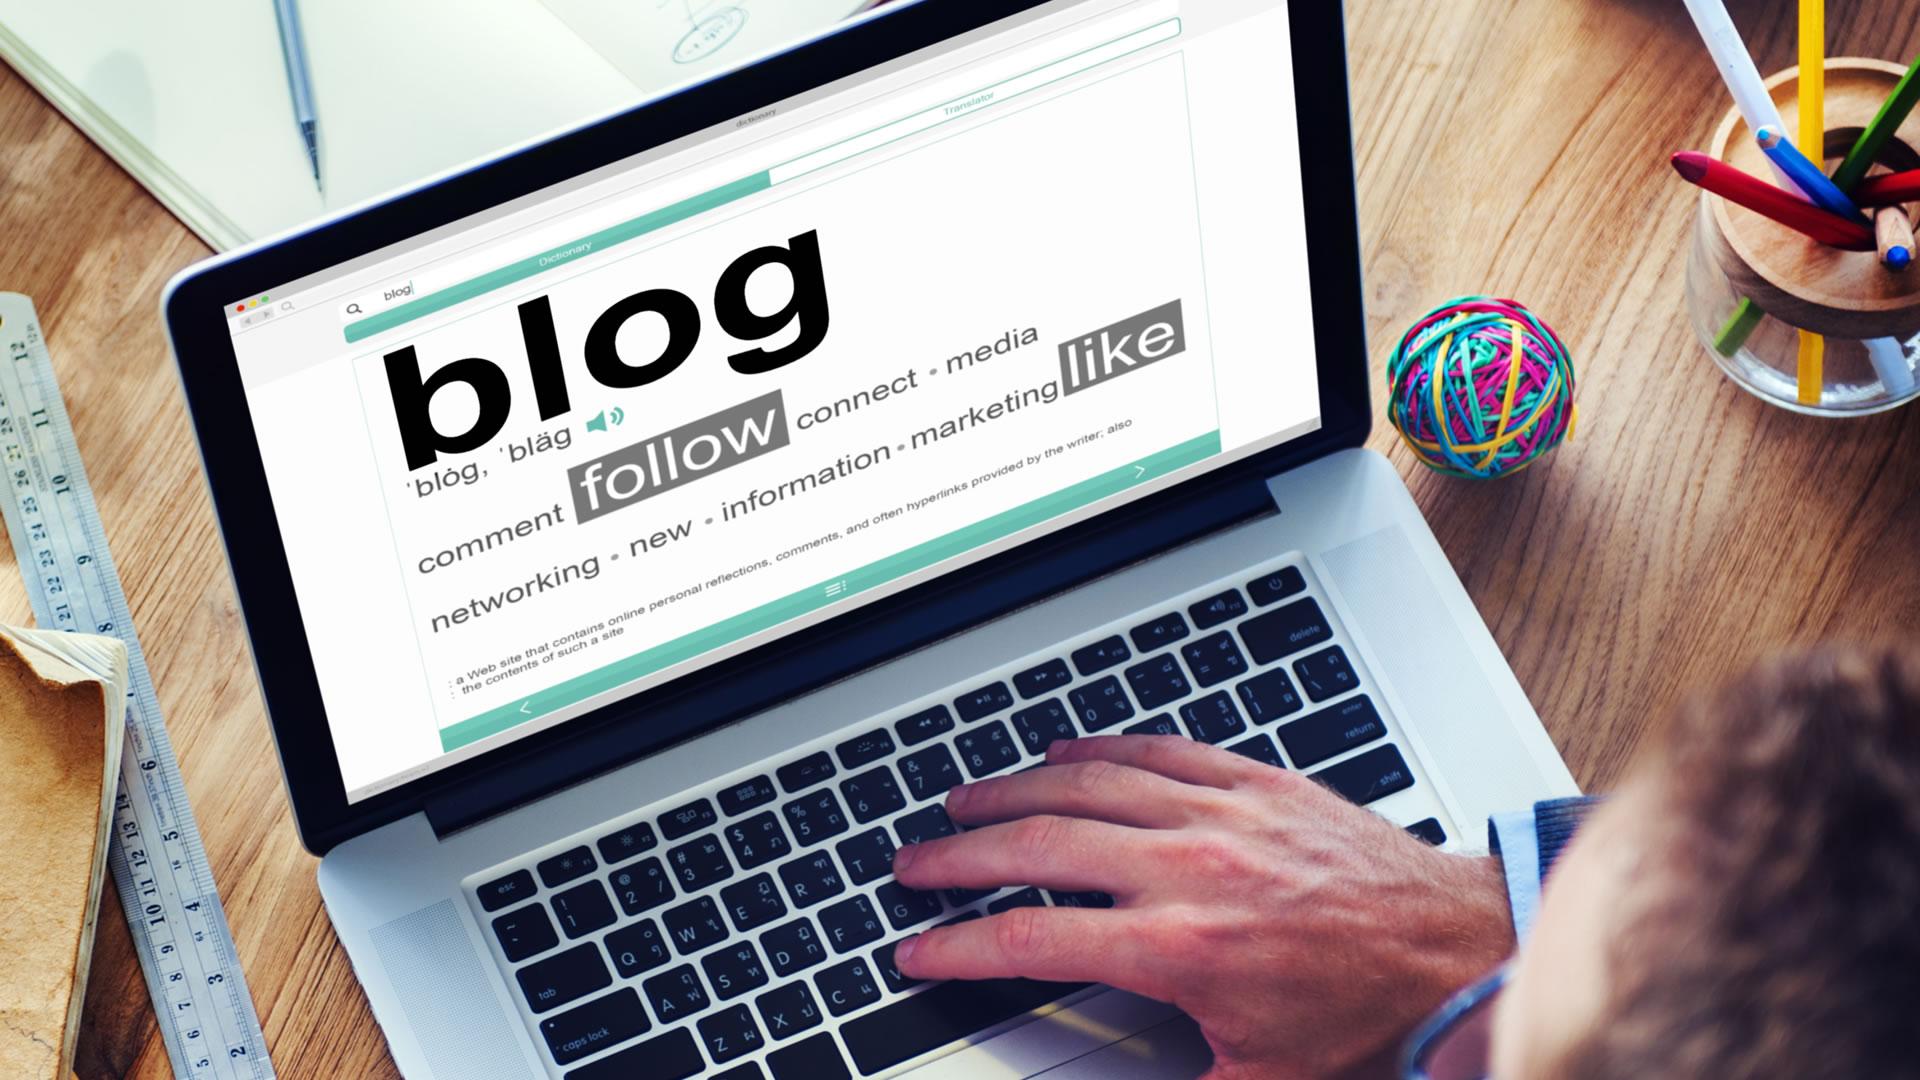 blogs blog